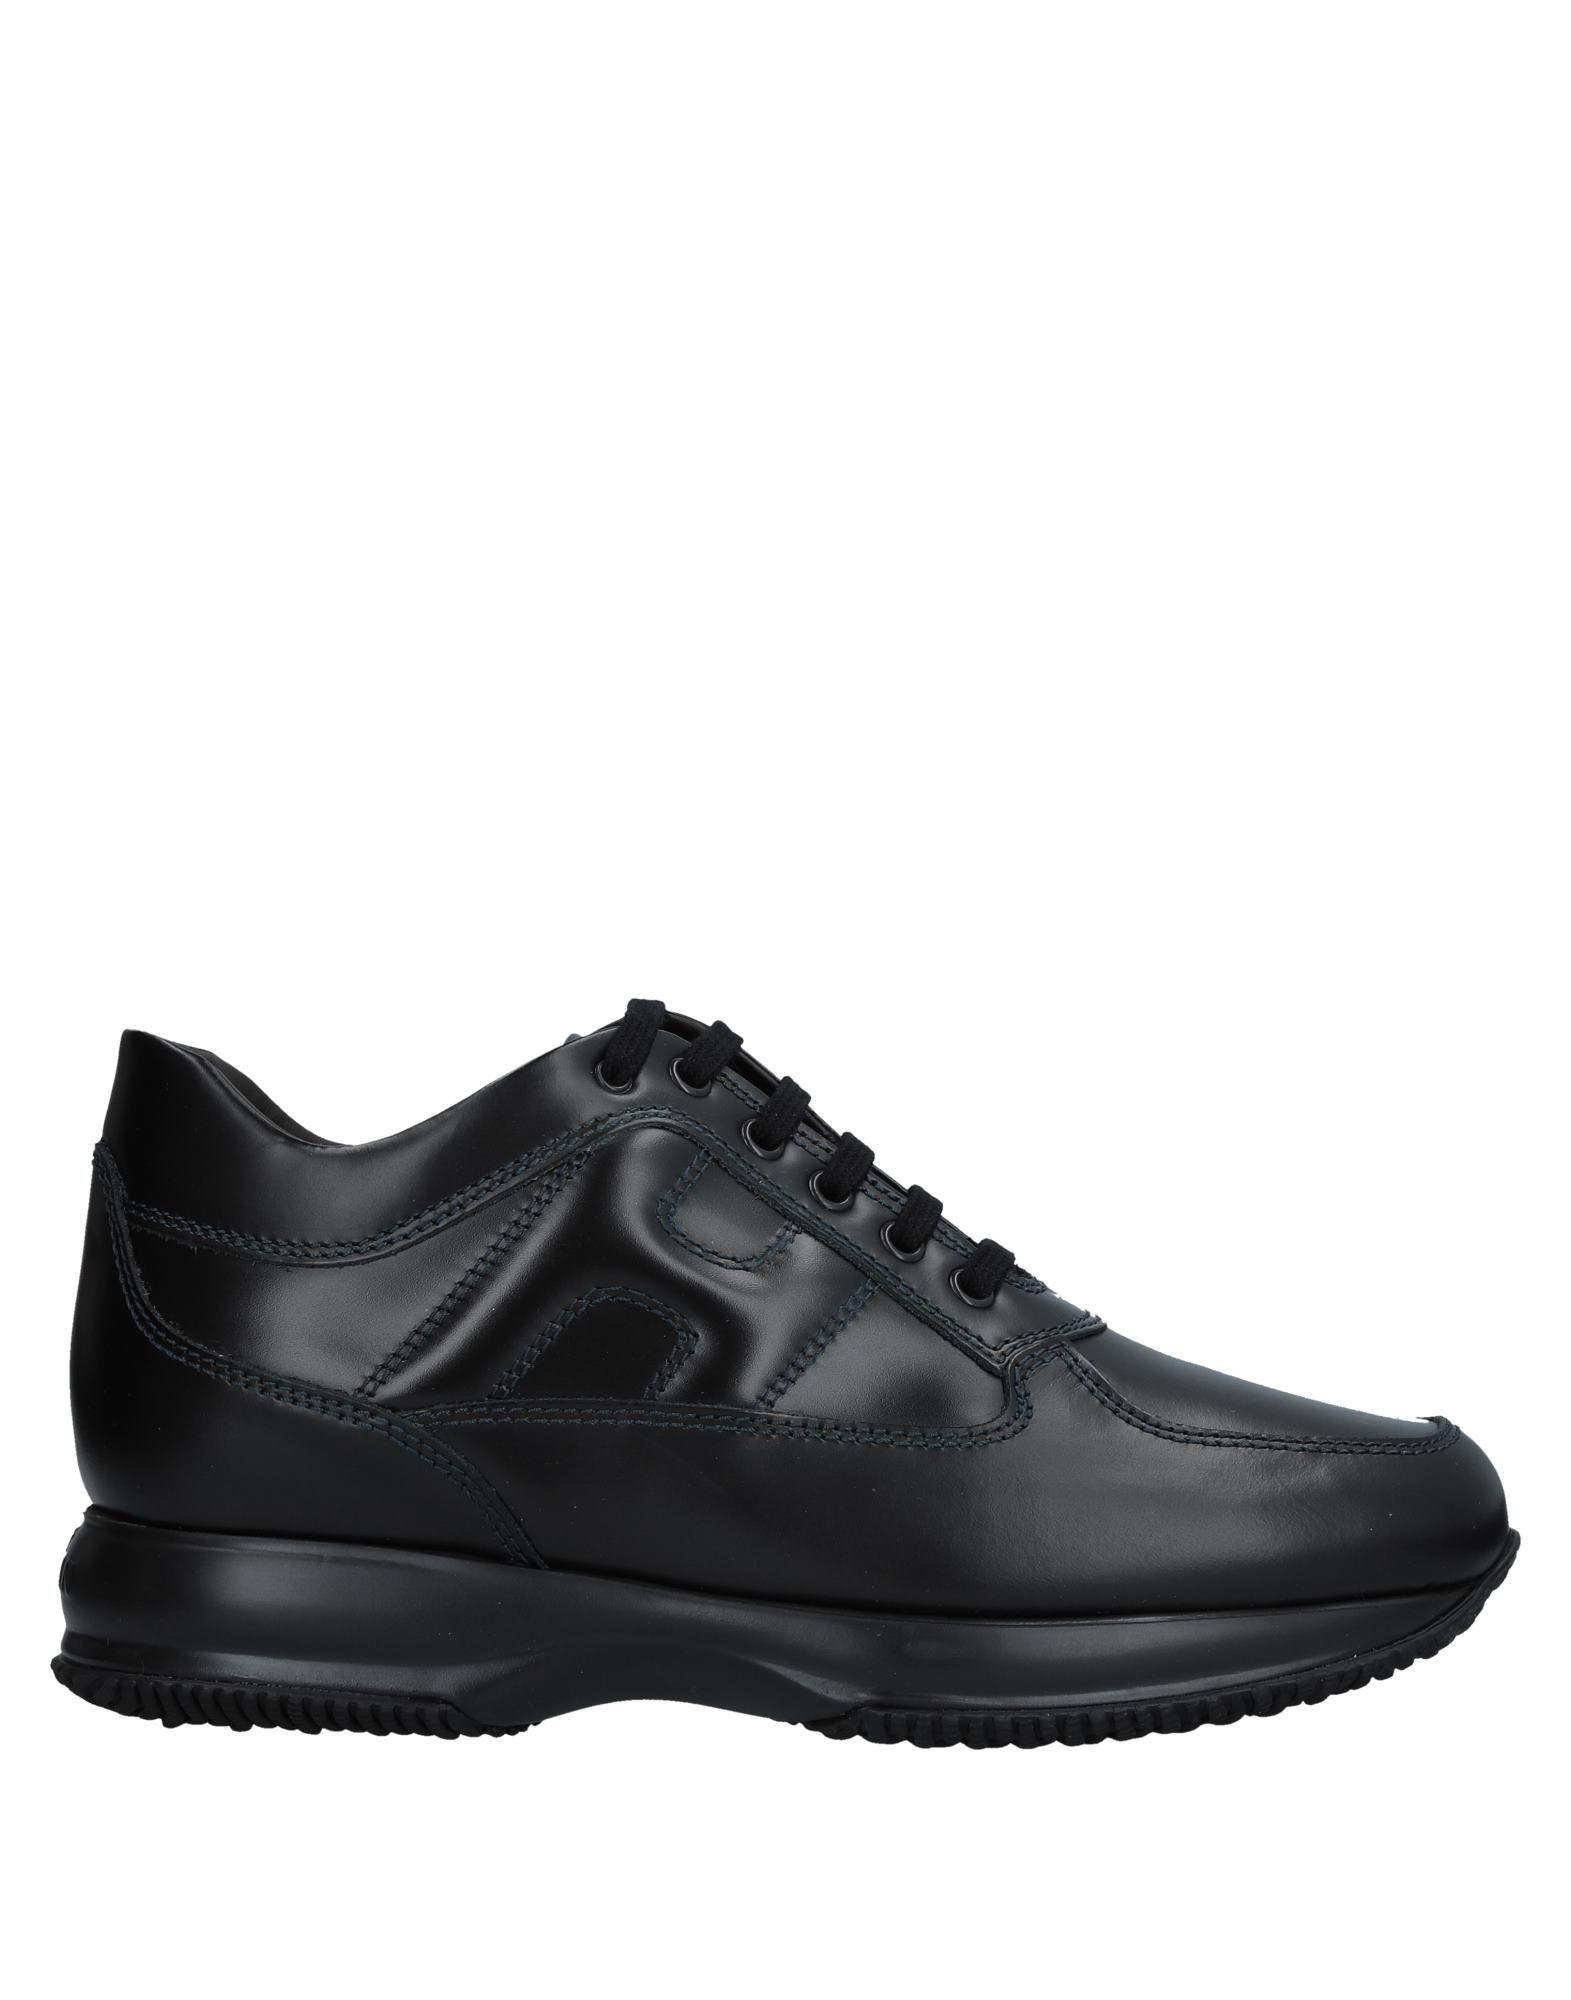 Hogan Sneakers Herren  11541460NQ Gute Qualität beliebte Schuhe